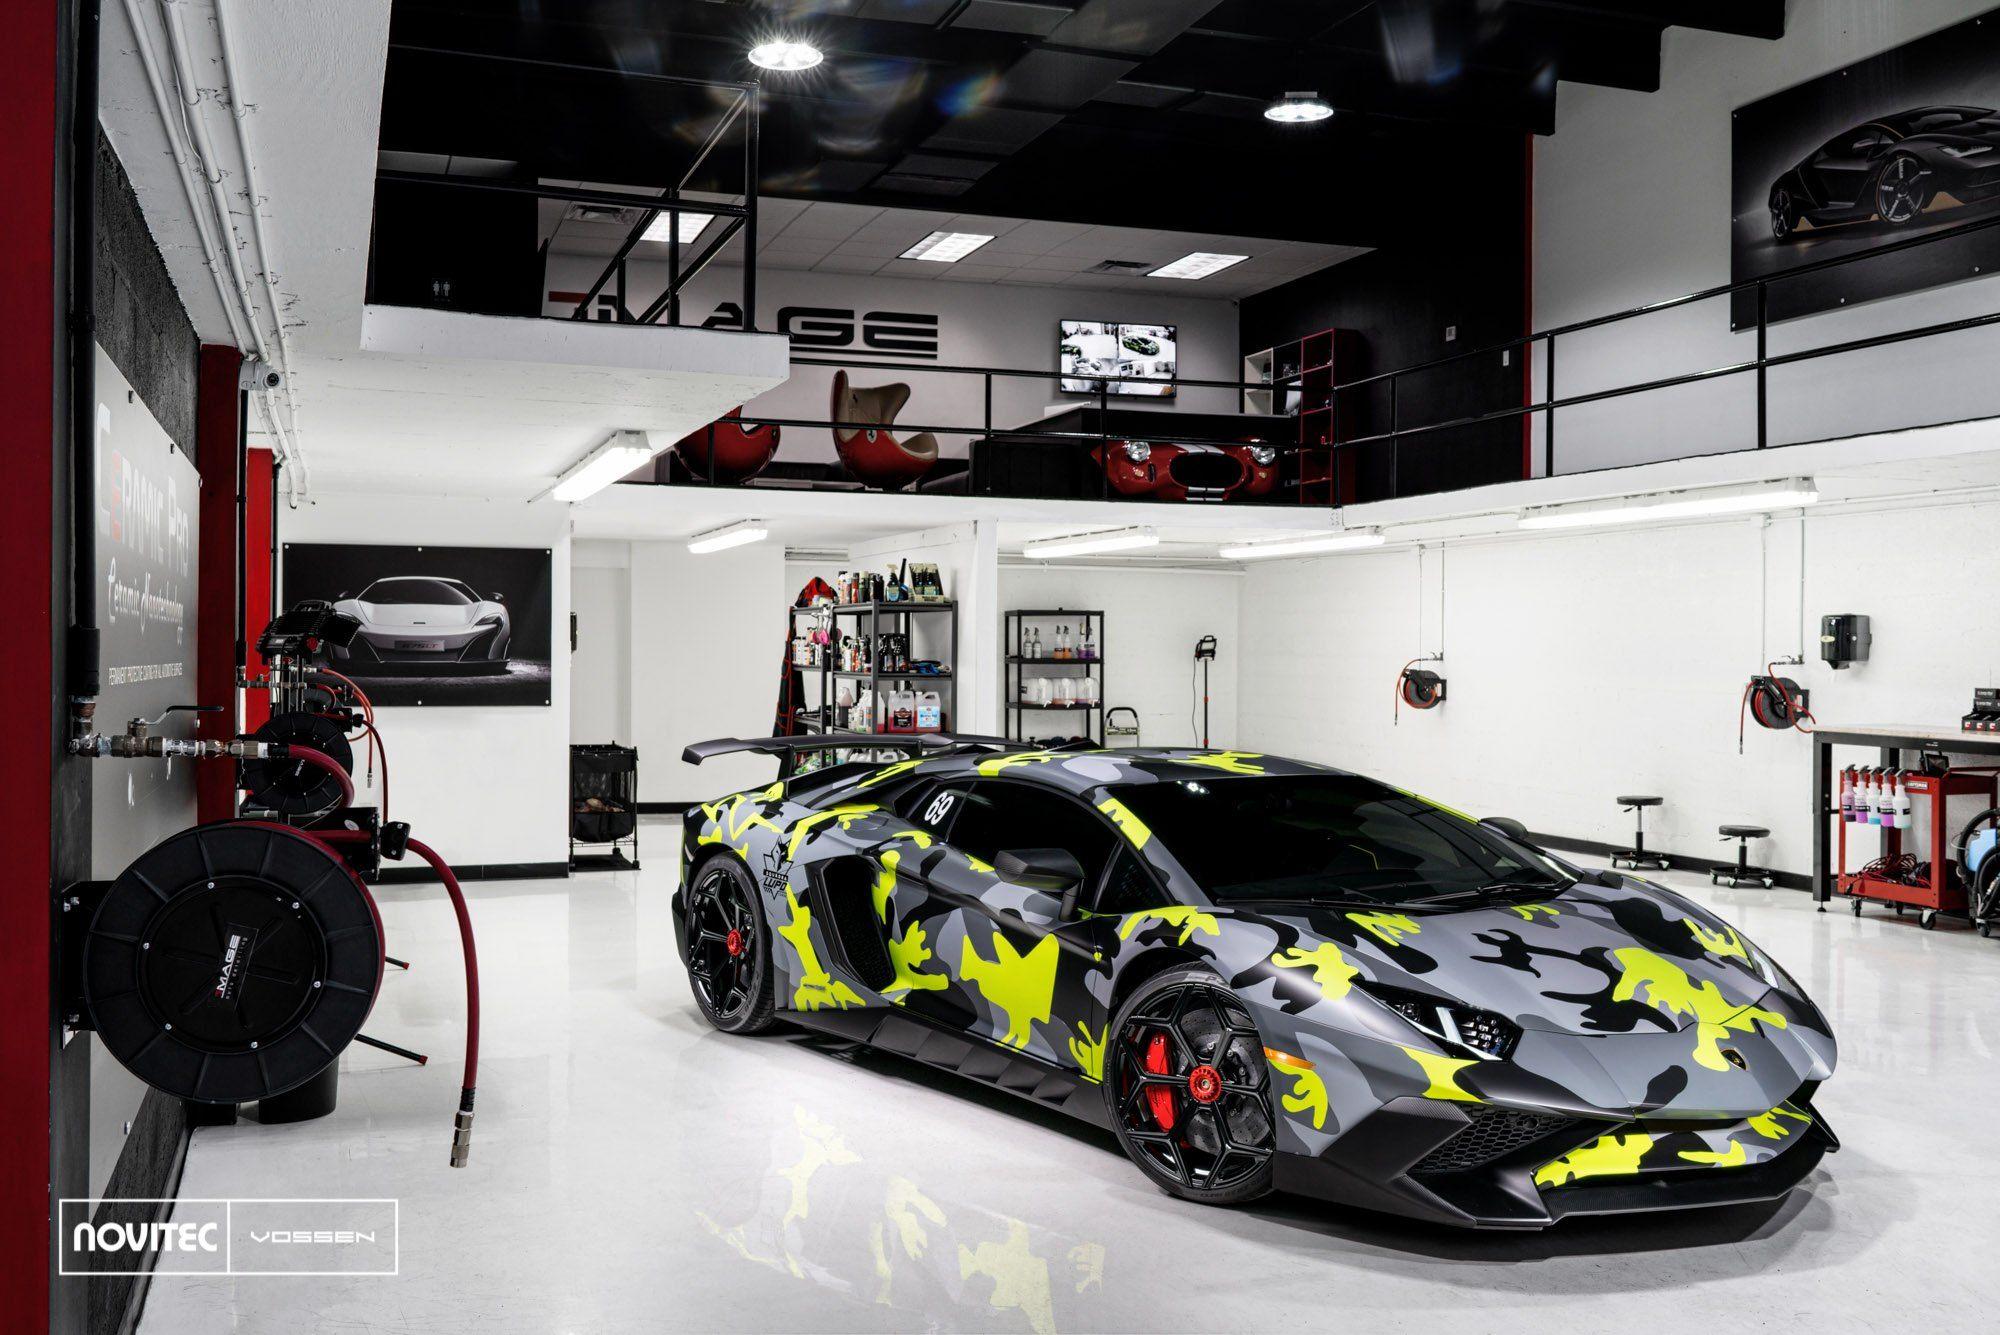 Toxic Camo Wrapped Lamborghini Aventador On The Showroom Floor By Vossen Car Showroom Interior Car Mechanics Garage Lamborghini Aventador